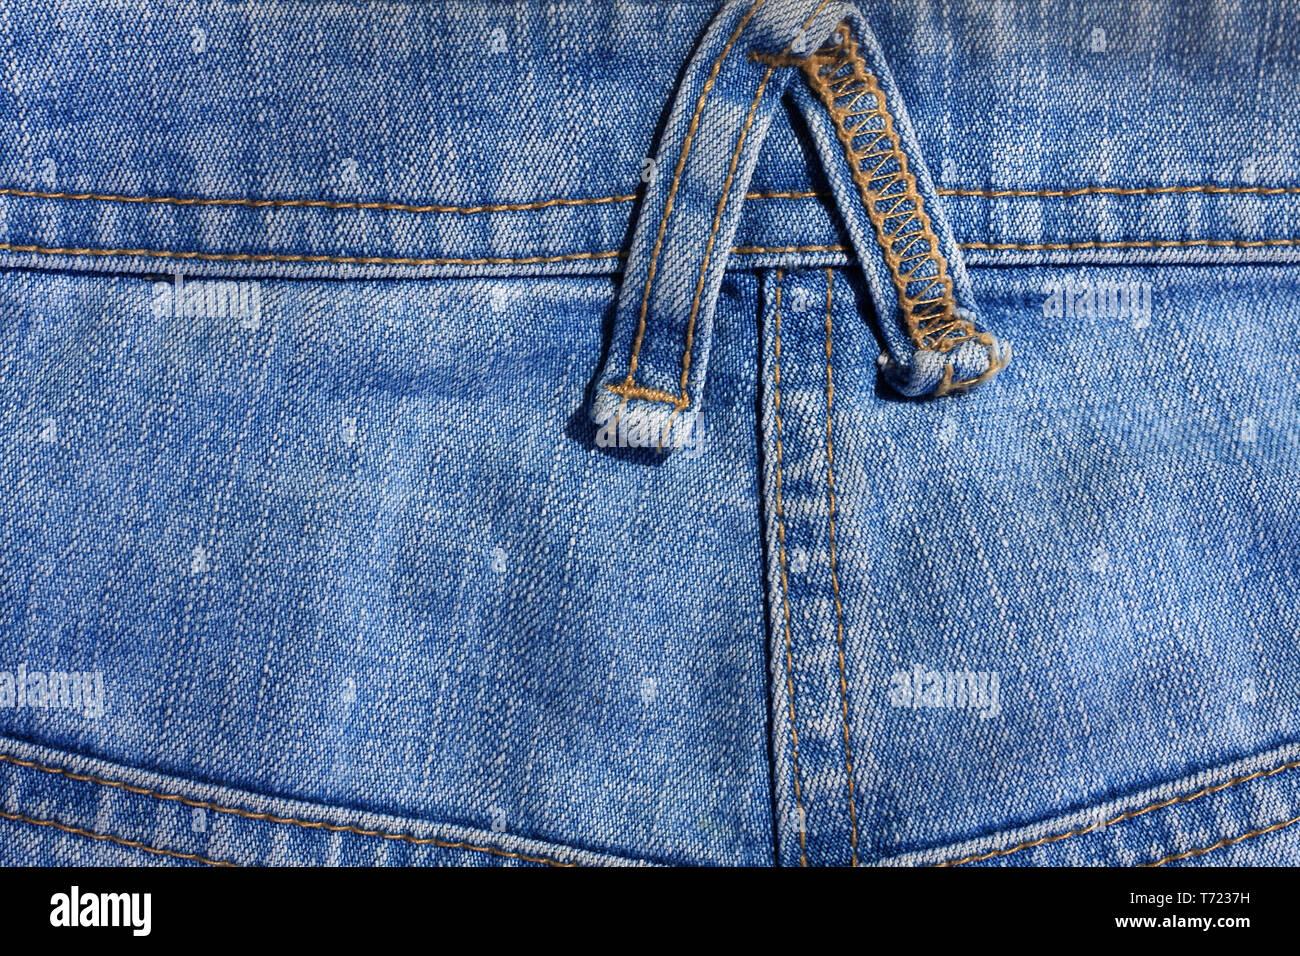 Jeans yoke - Stock Image